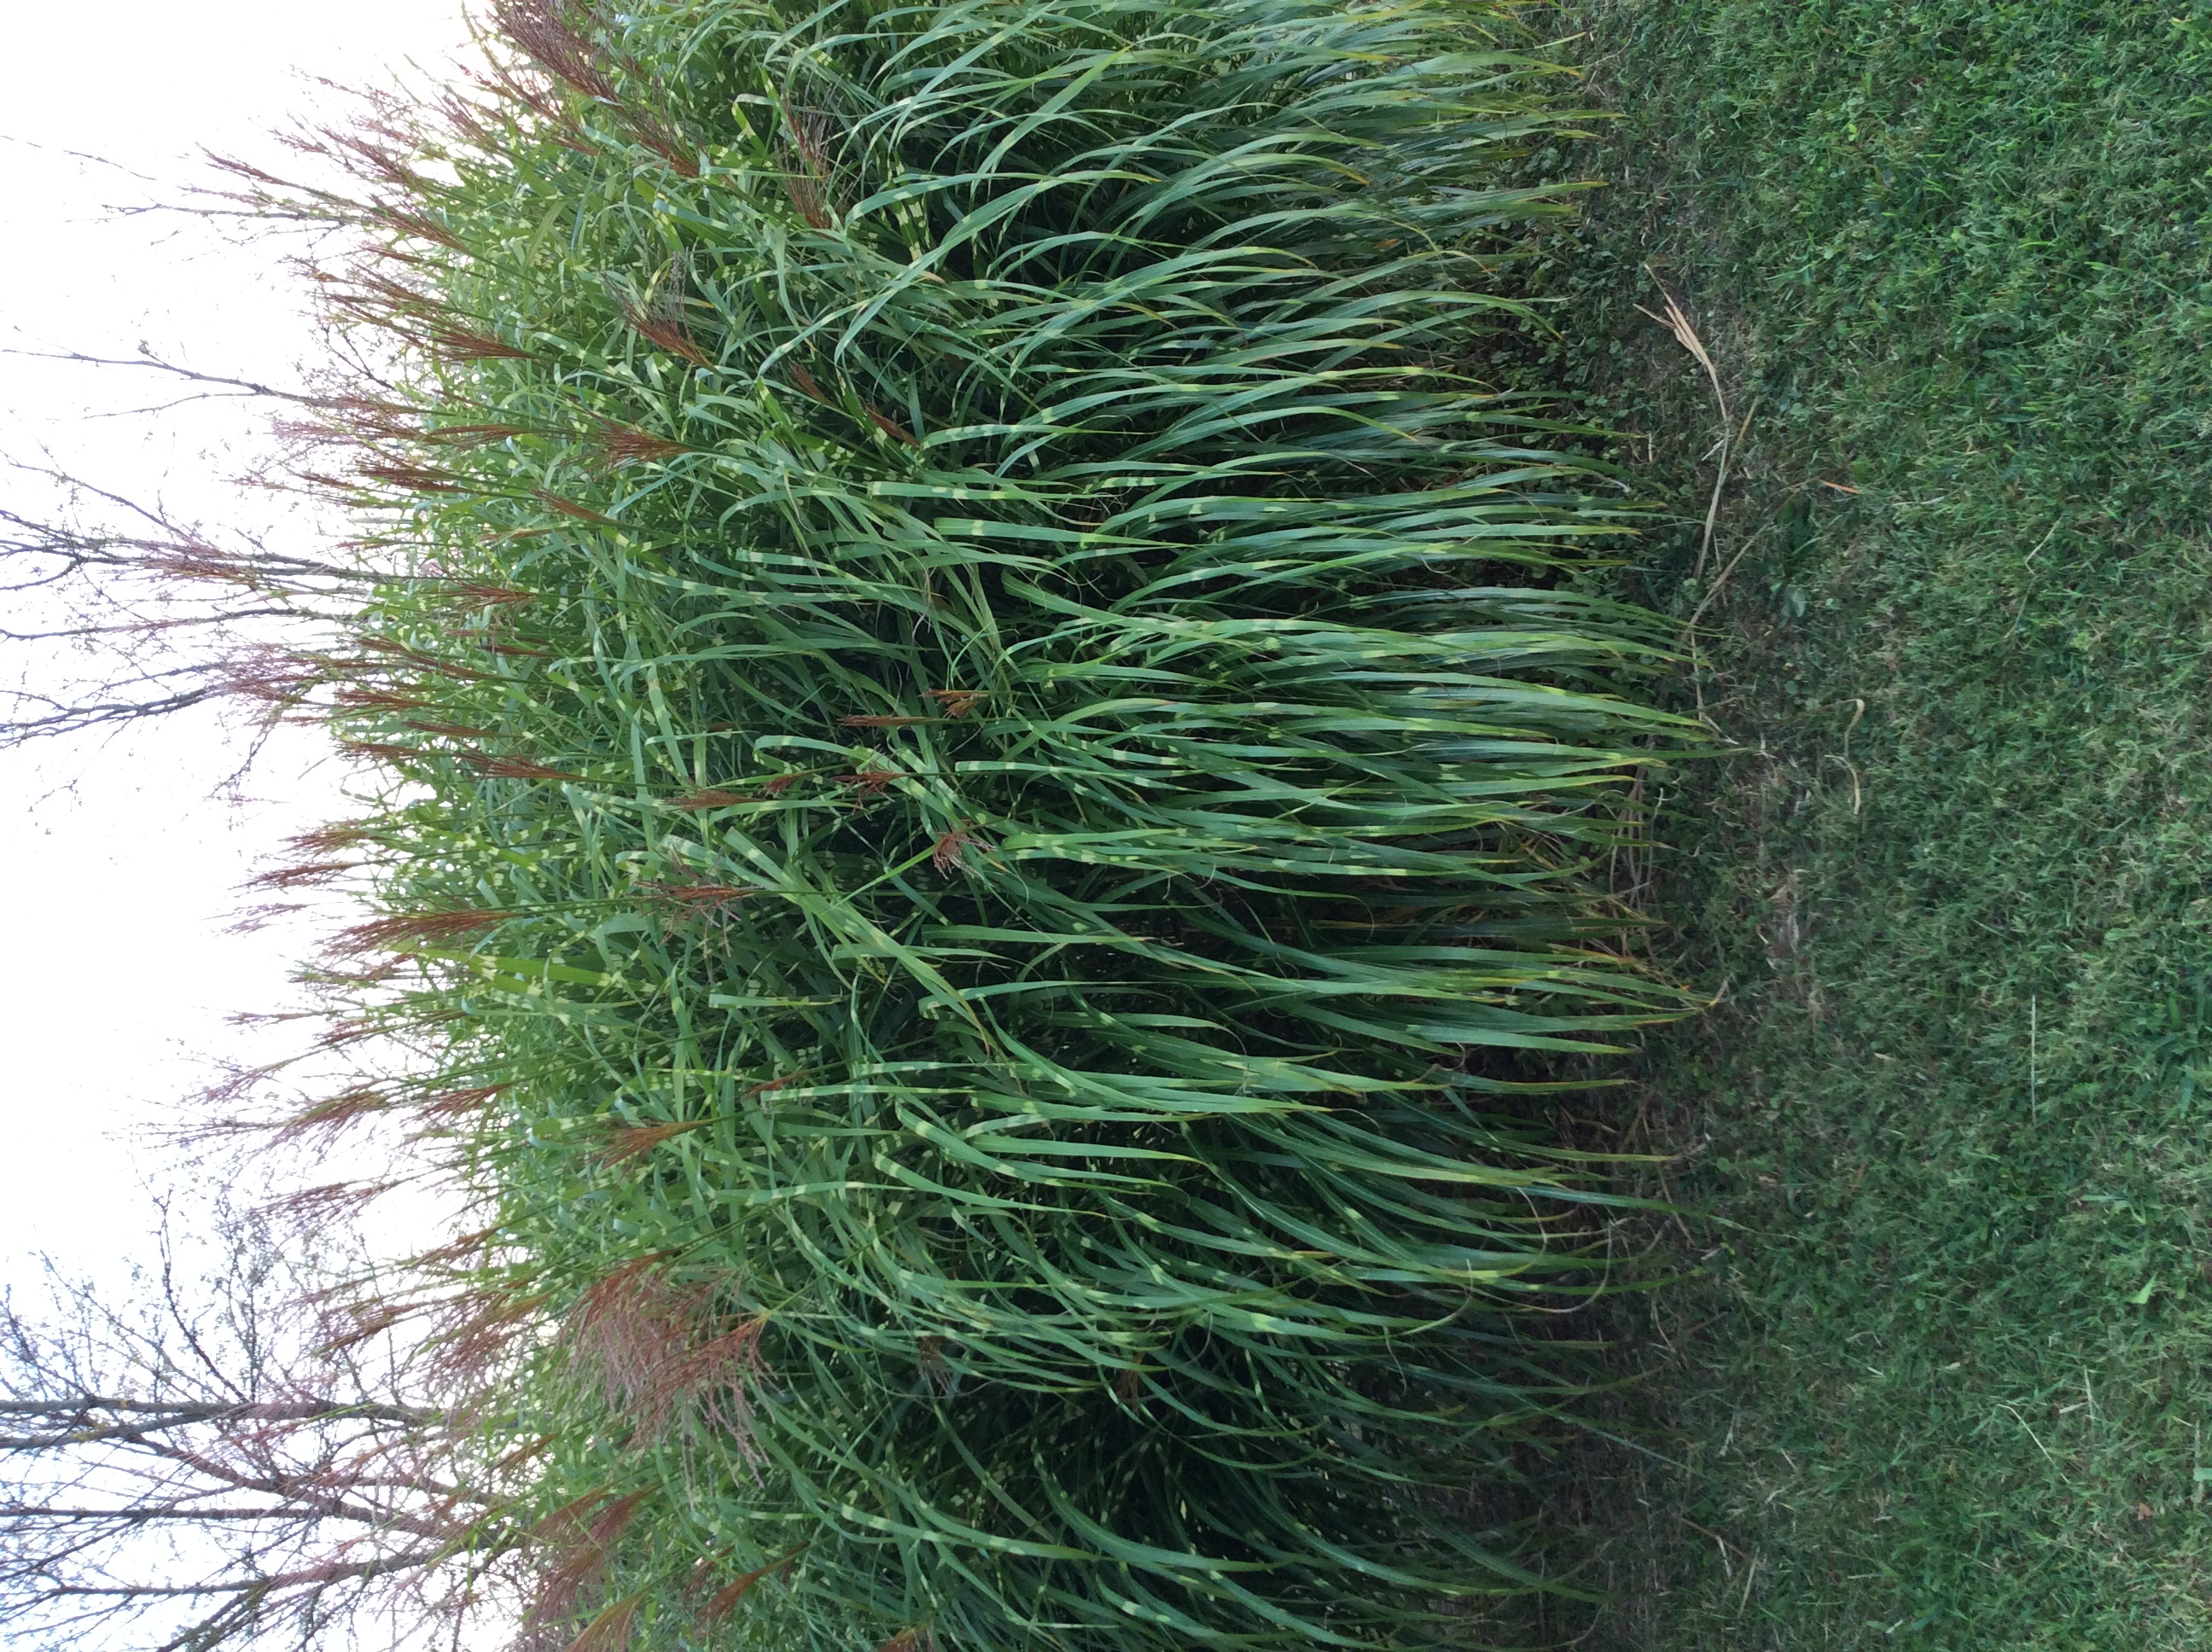 south american elephant grass